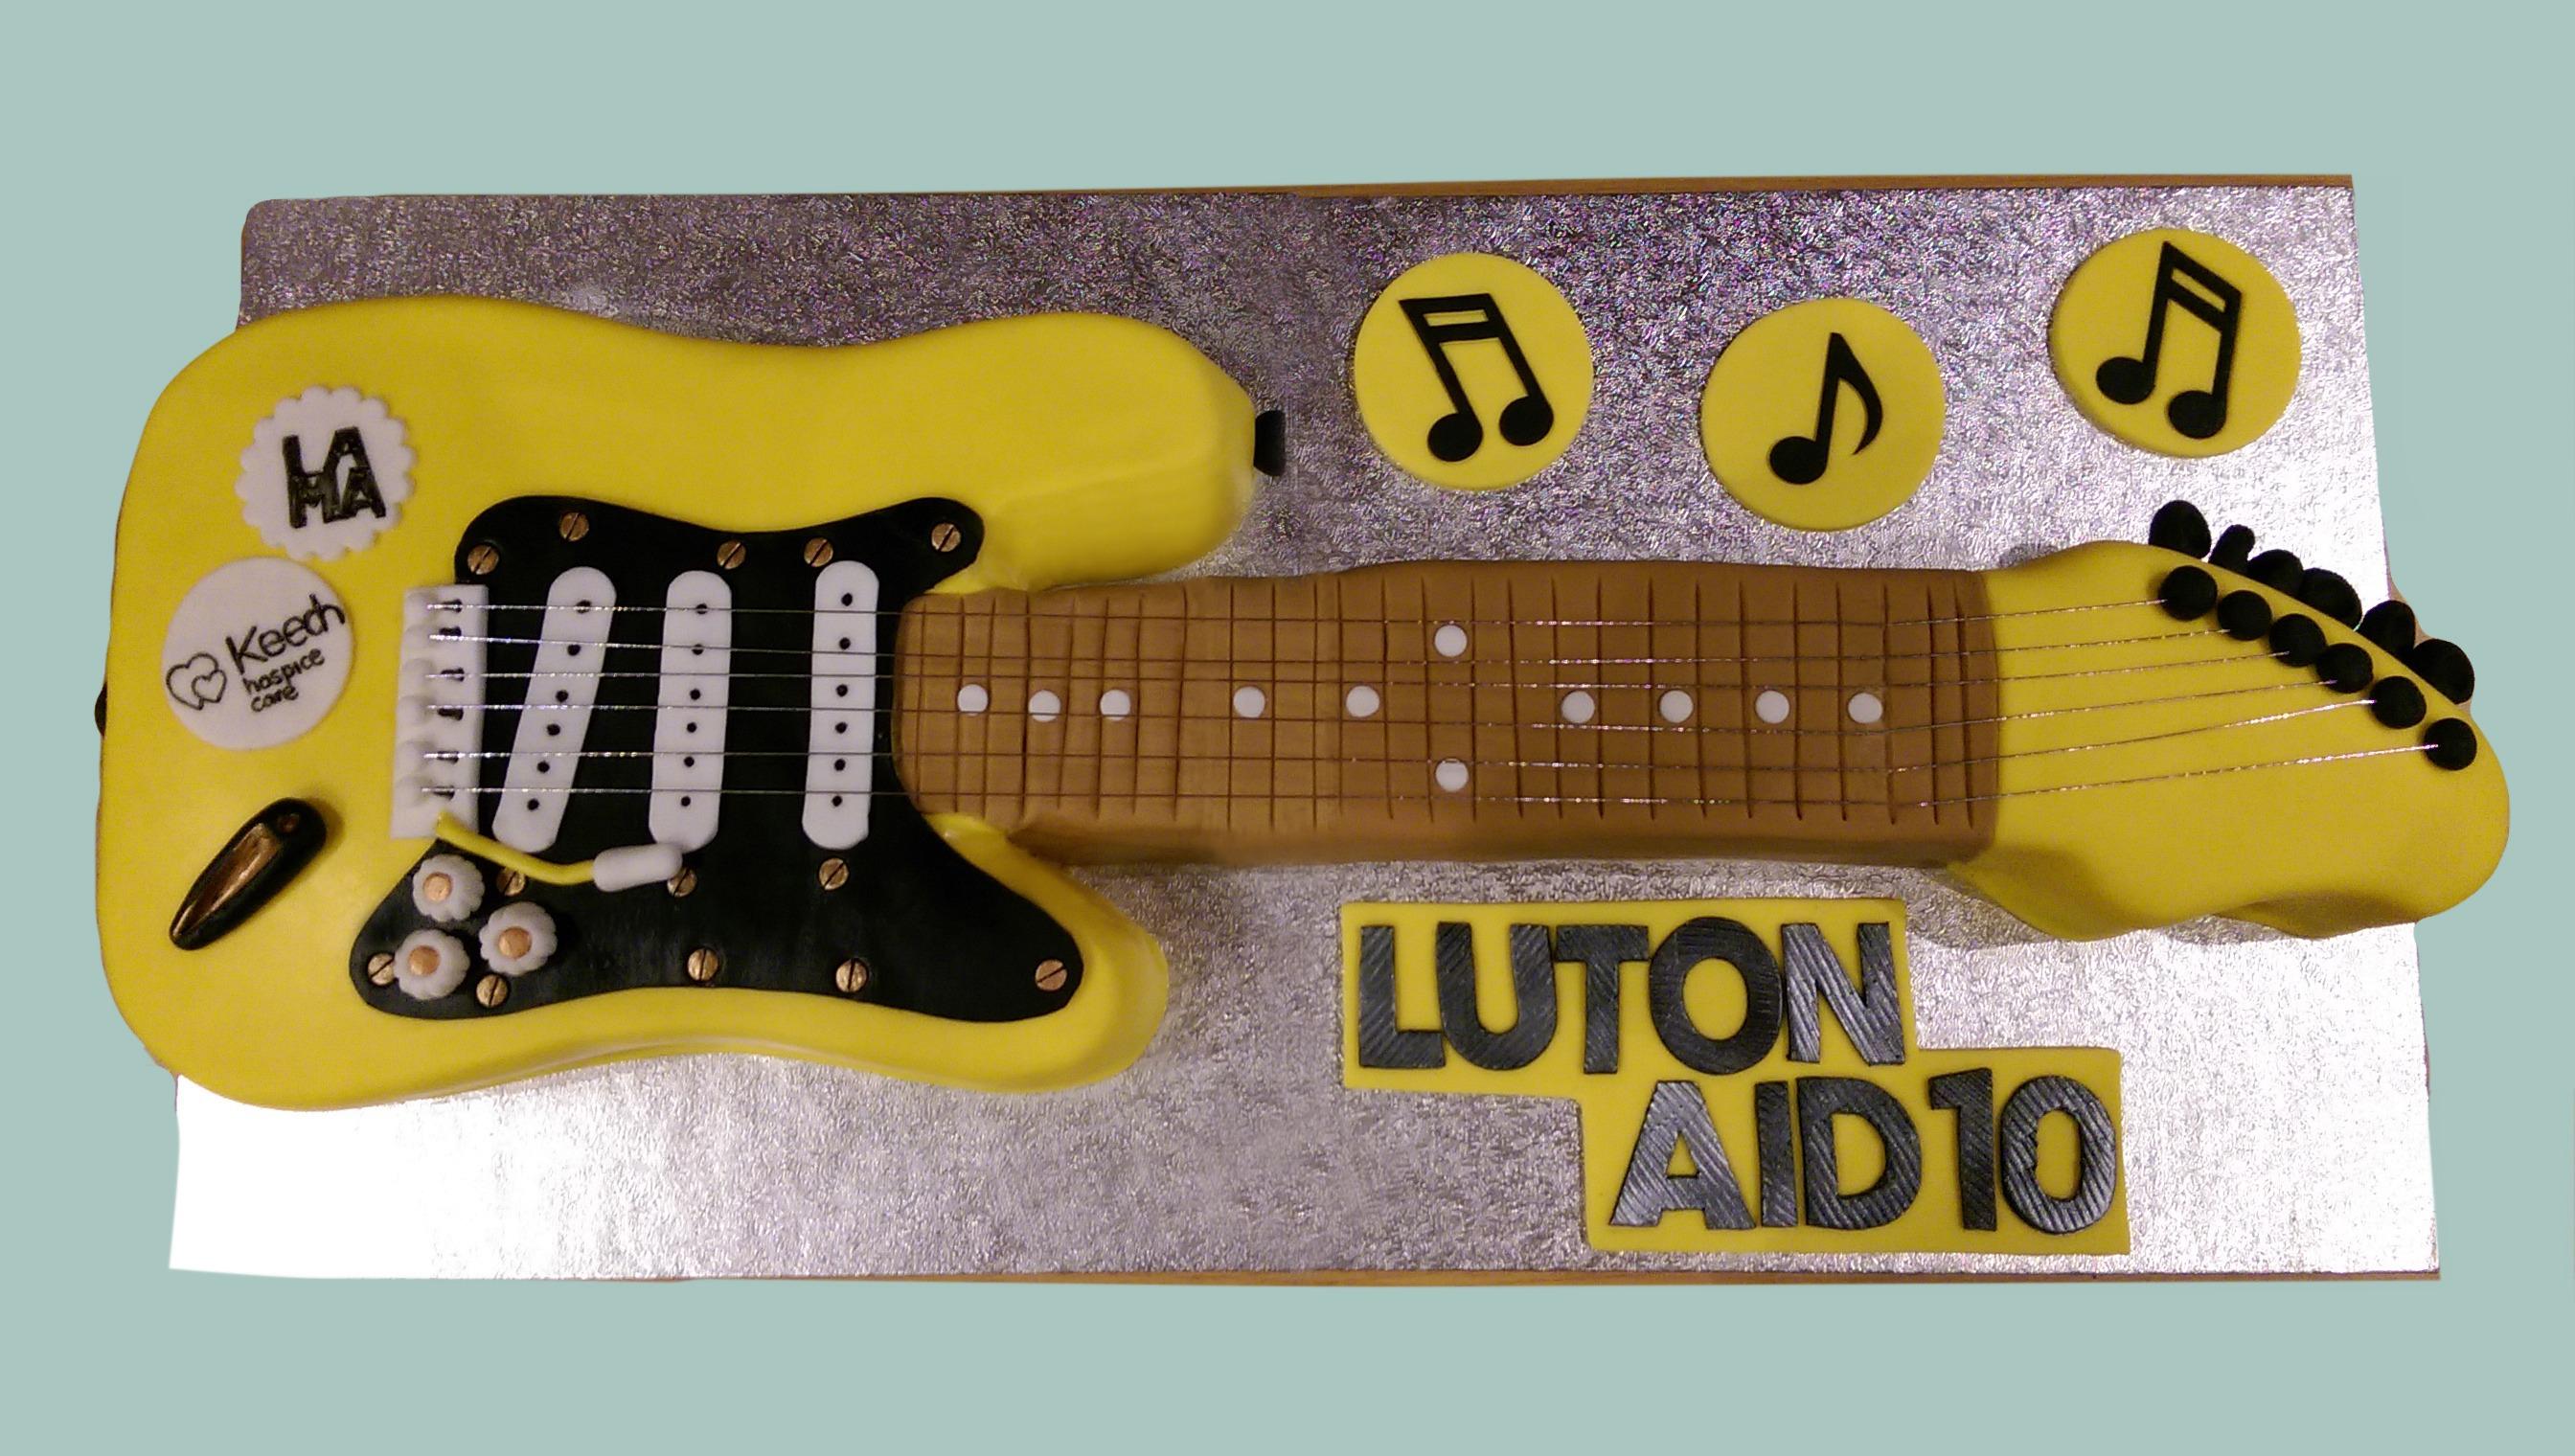 Luton Aid Guitar Cake